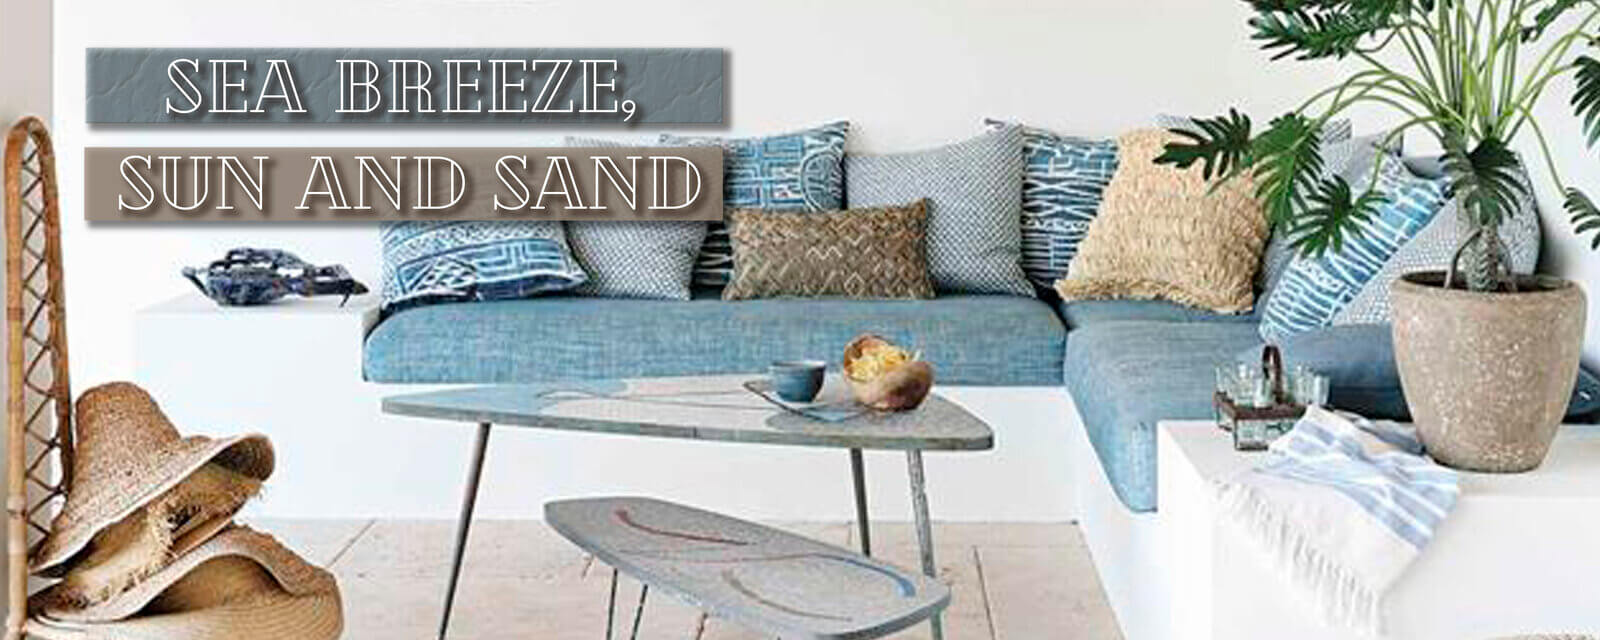 Sea breeze, Sun and Sand